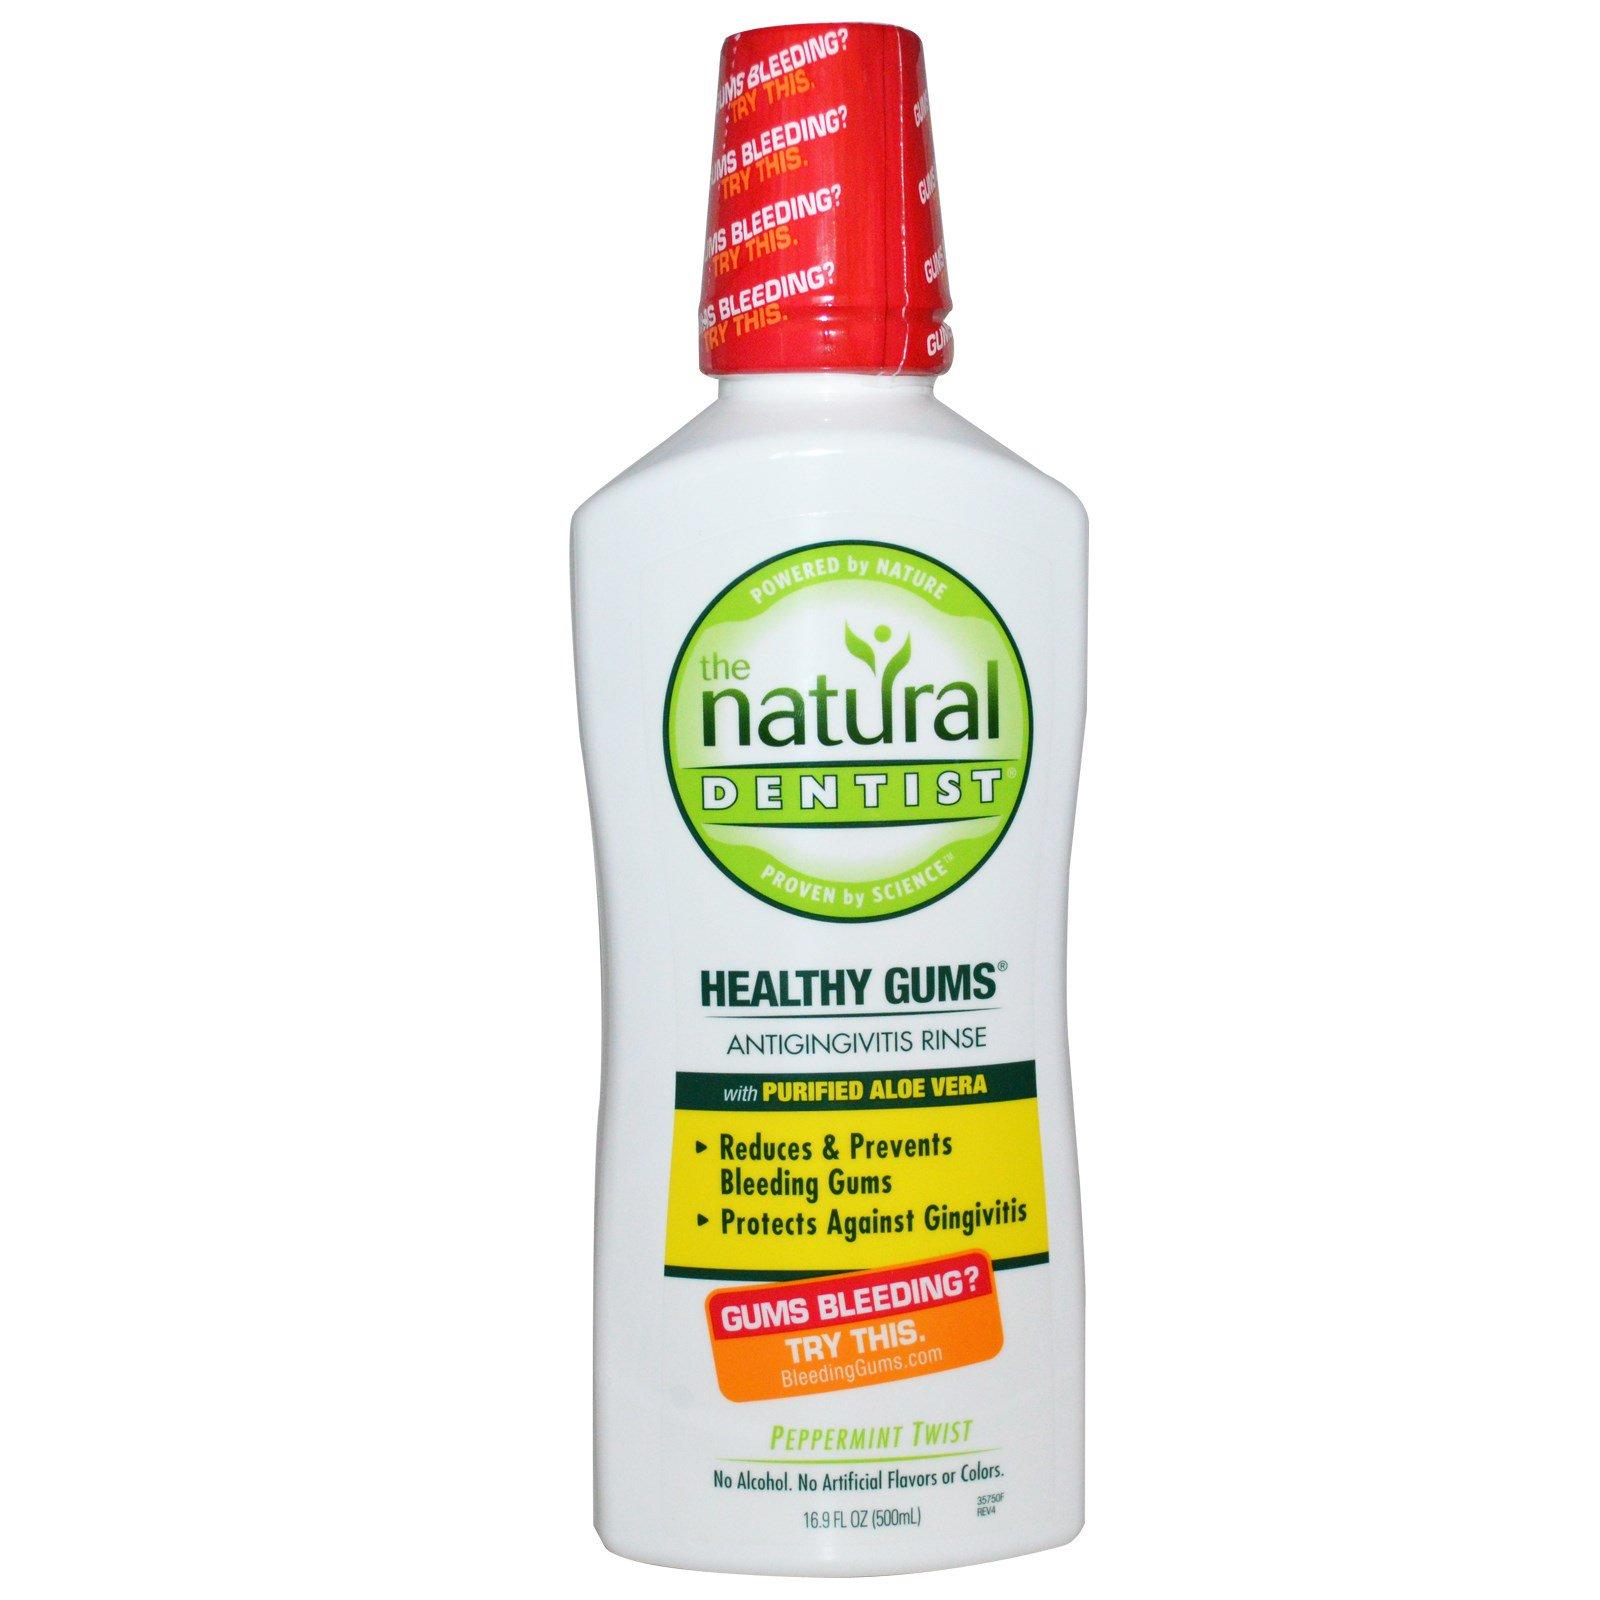 Natural dentist mouthwash rebate